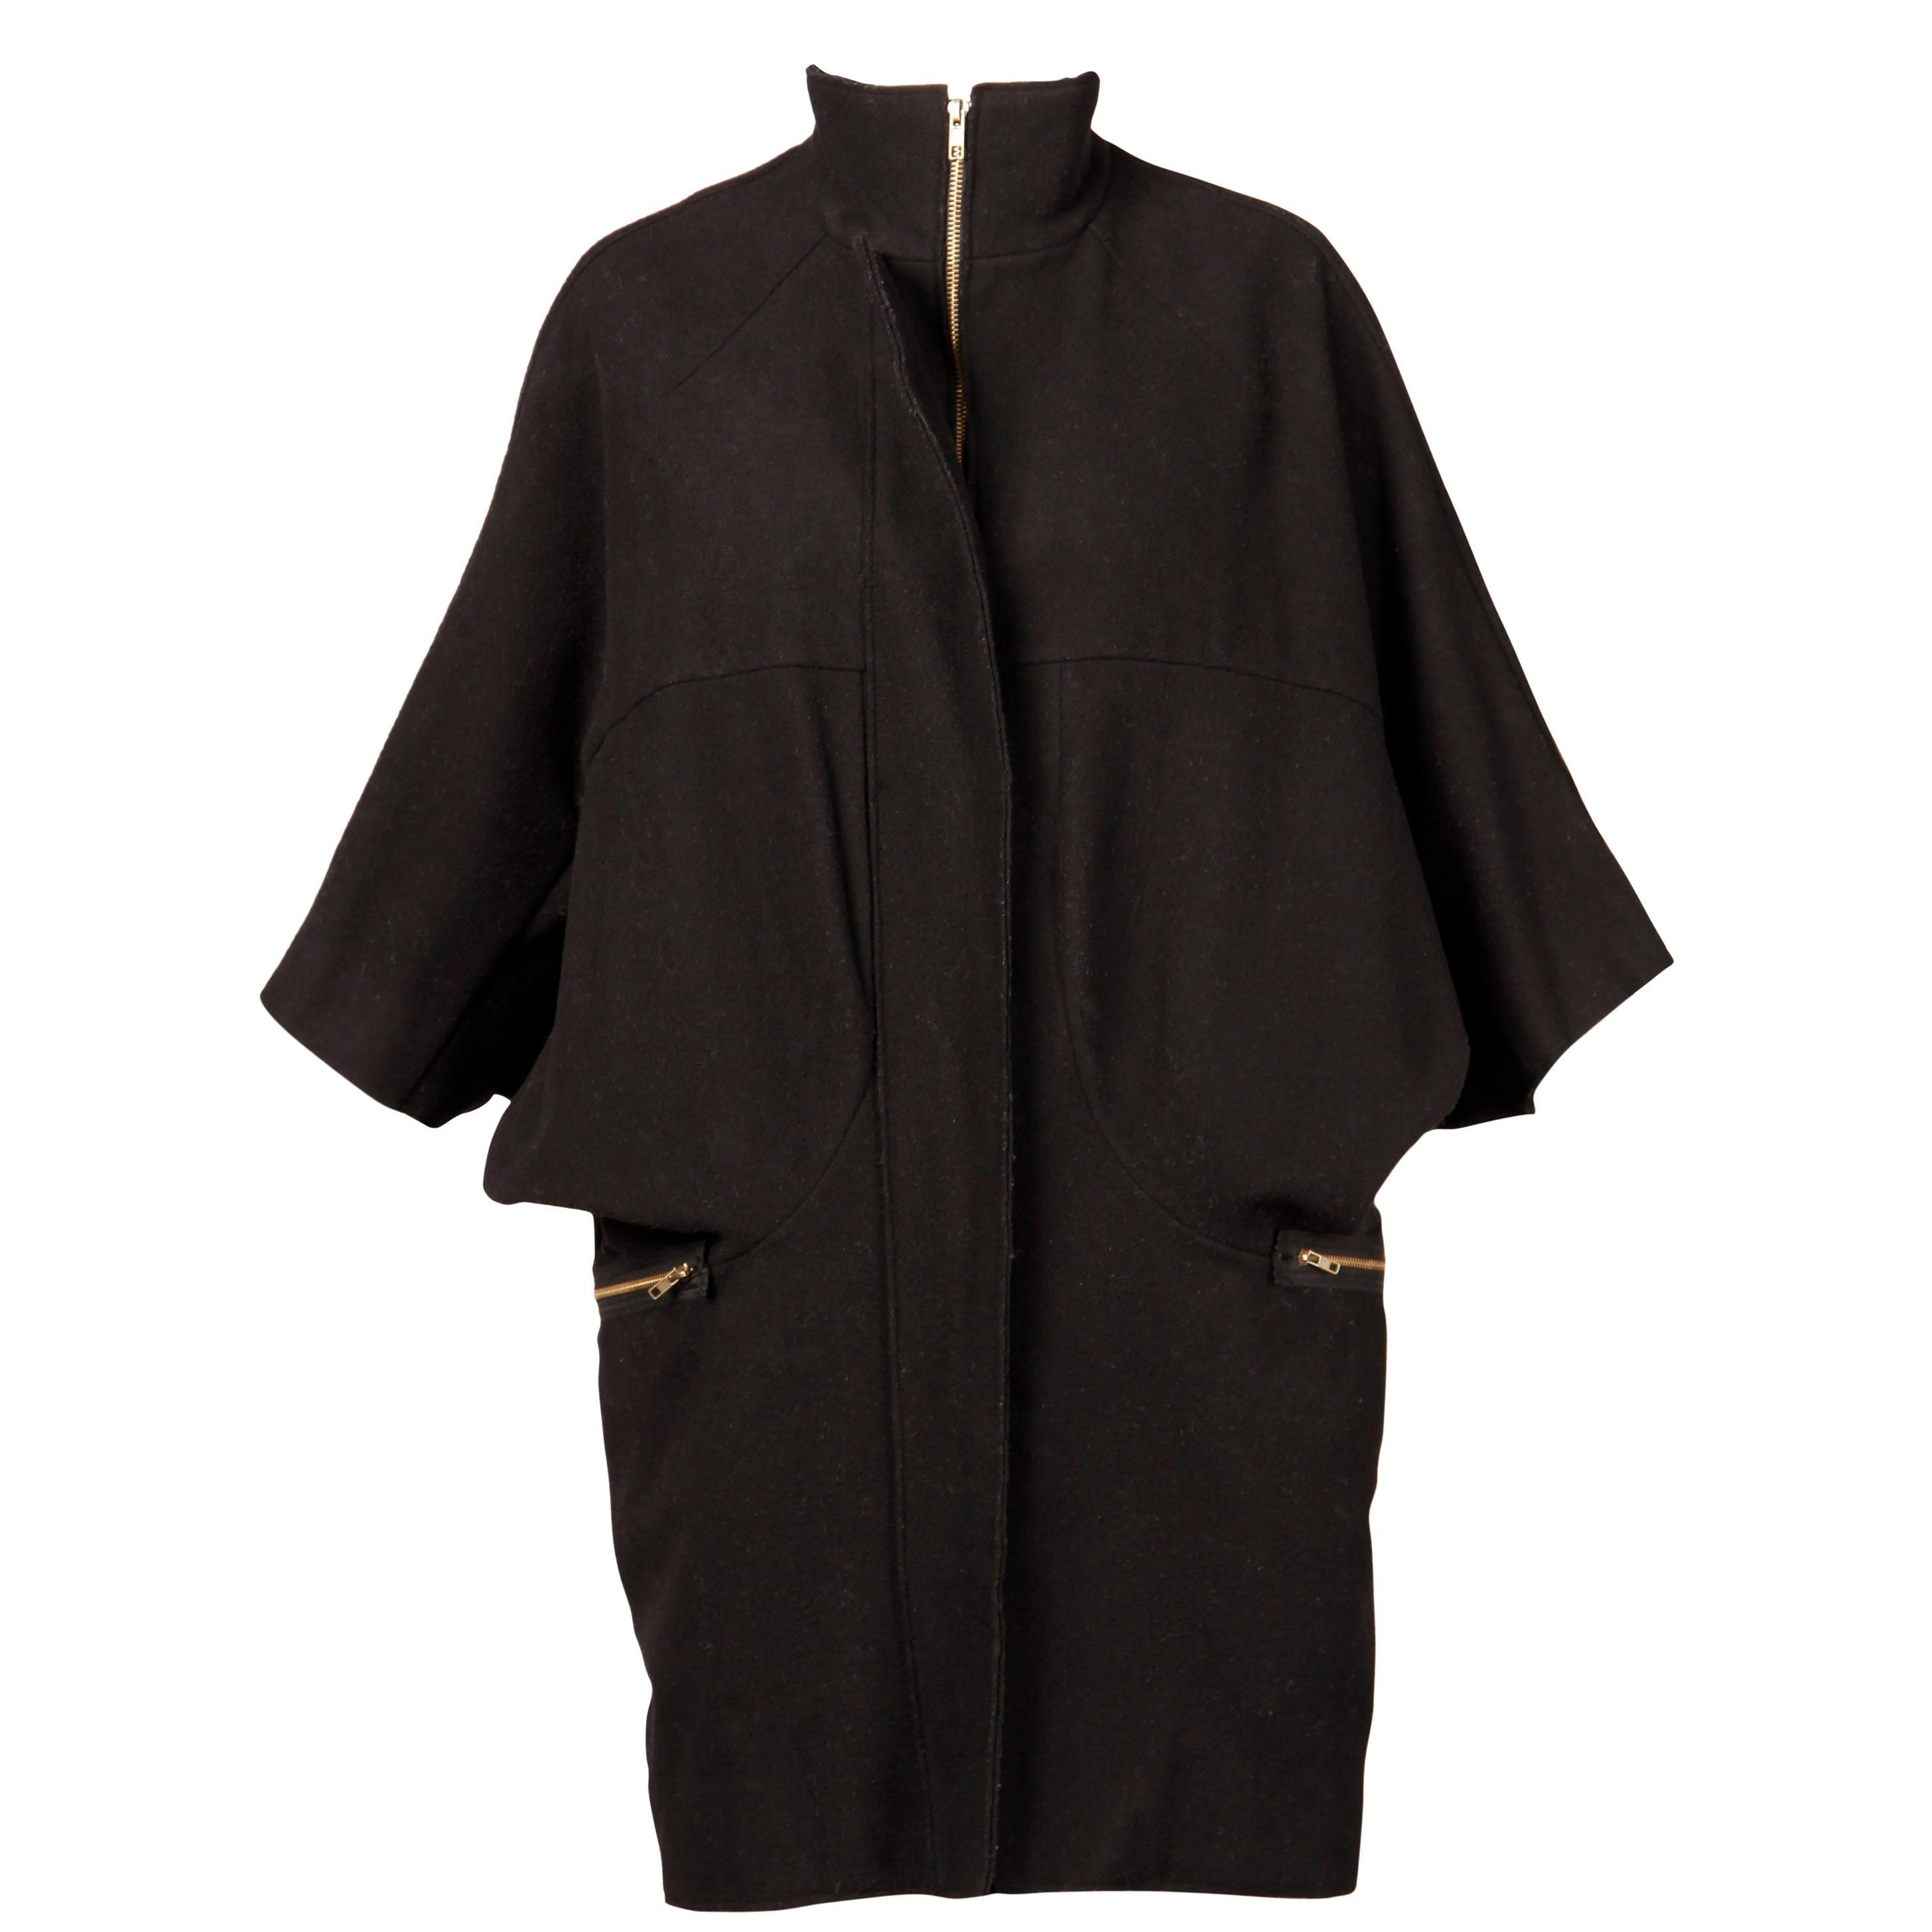 Marni Black Wool Cape Coat